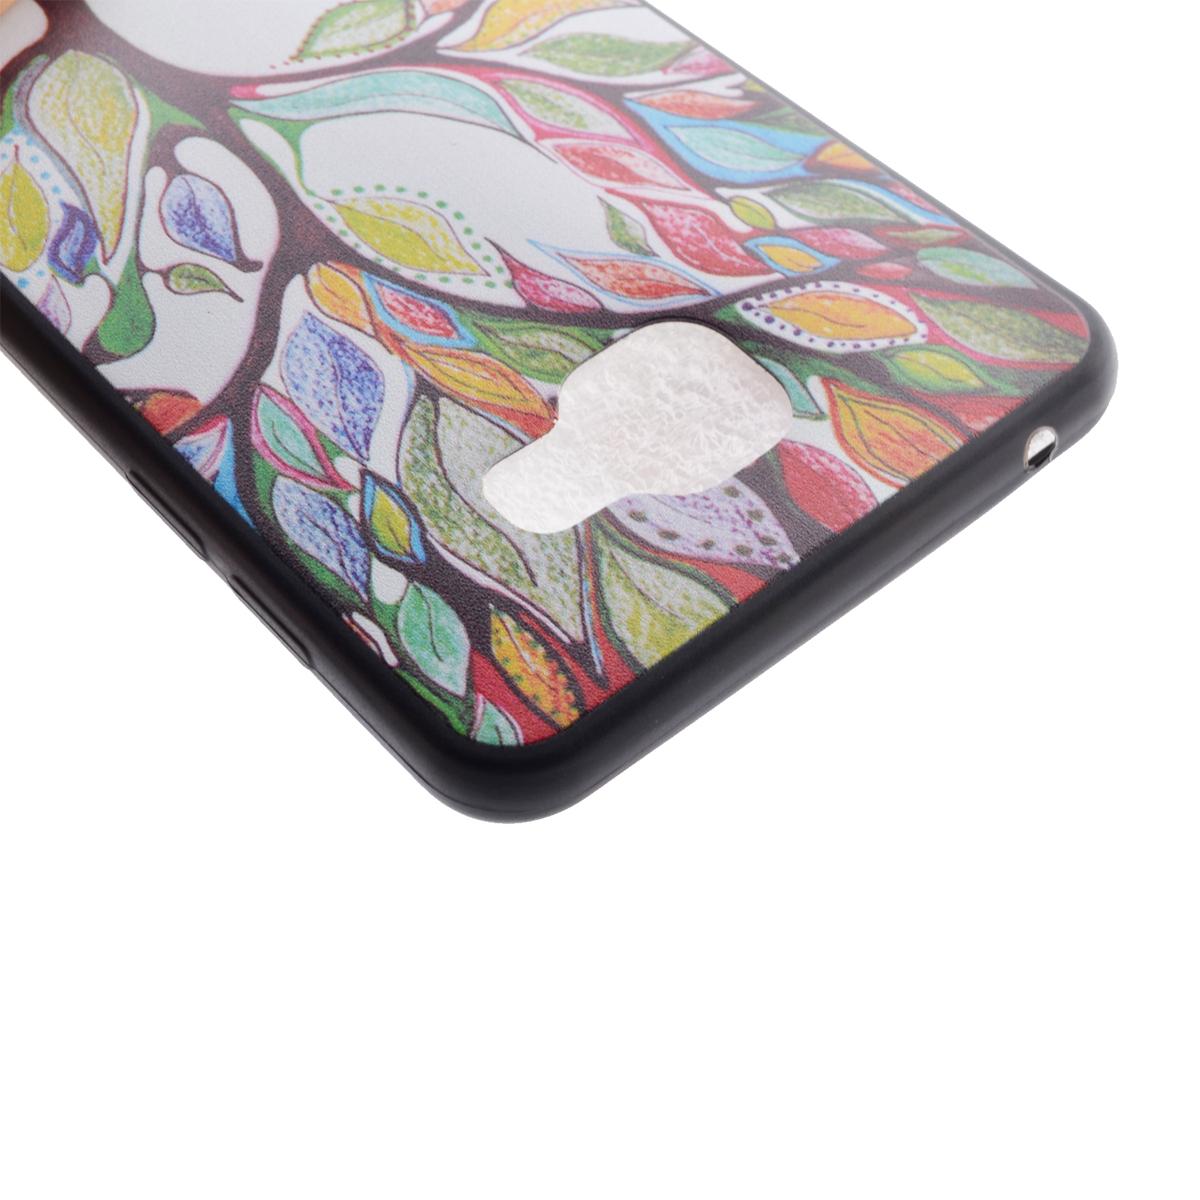 ... Hard Case belakang plastik penutup untuk HUAWEI . Source · Moonmini TPU belakang lembut untuk kasus Samsung Galaxy A5 (2016)A510 (aneka warna